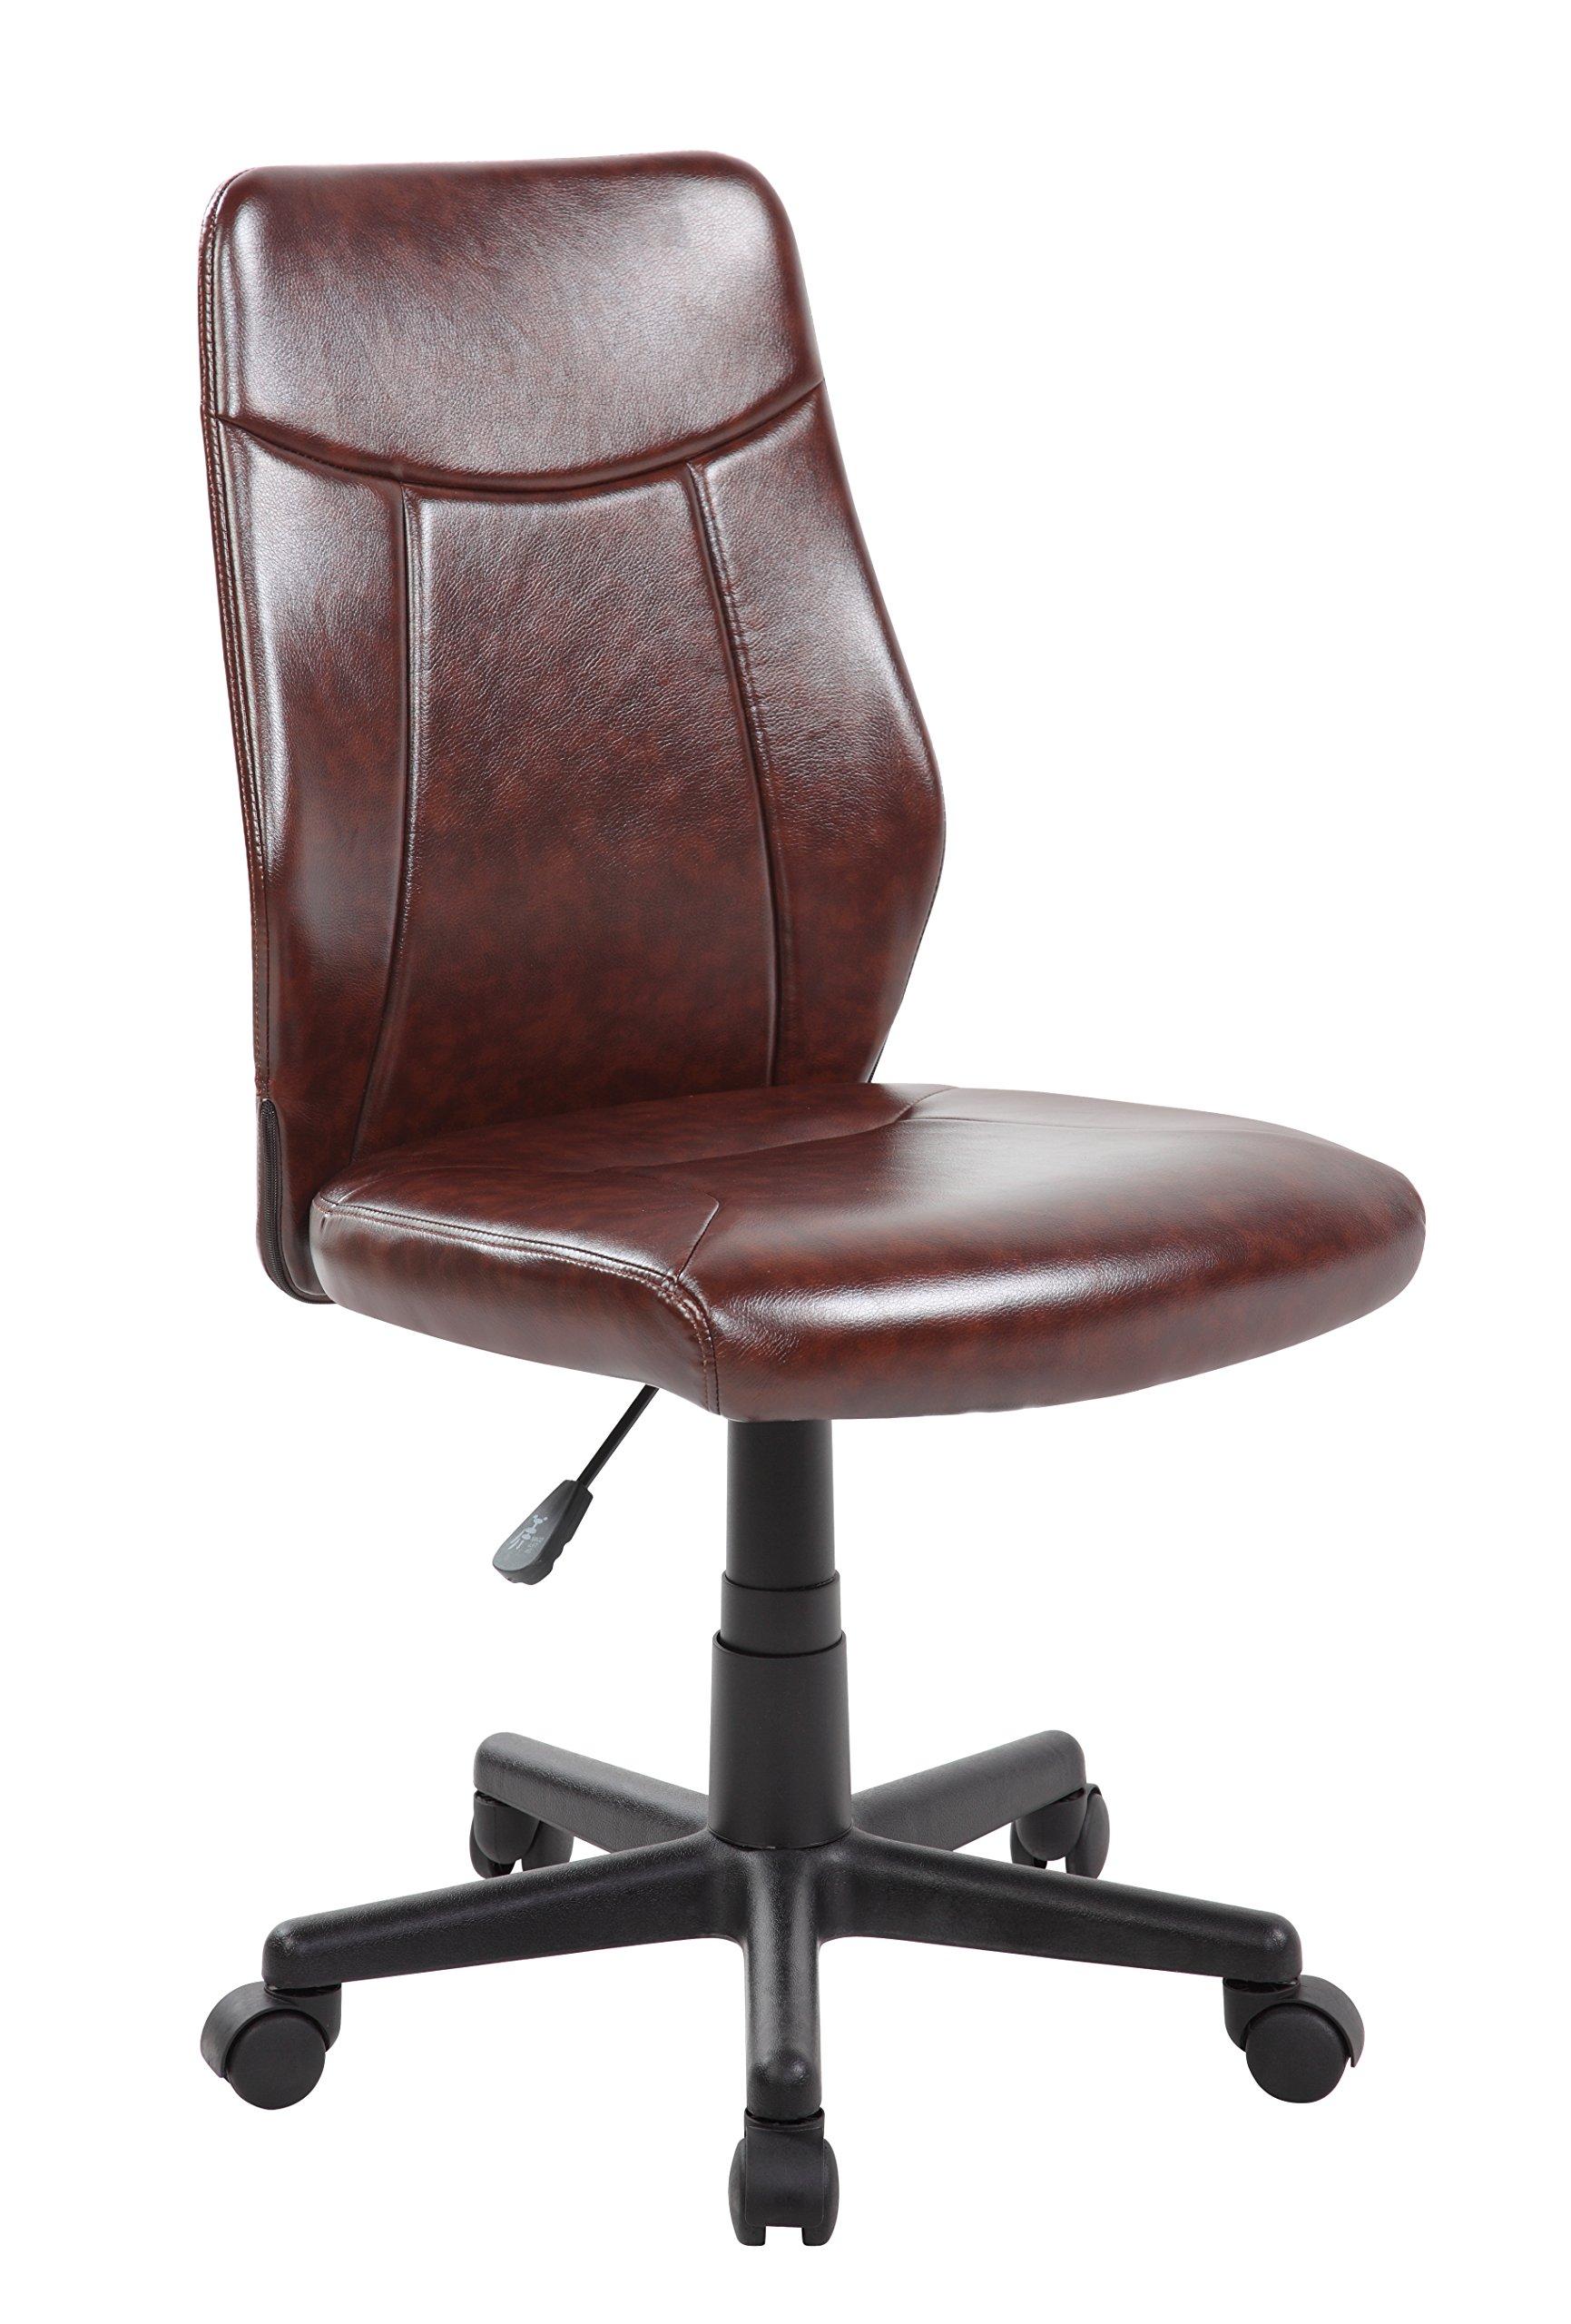 eurosports Mid Back PU Leather Adjustable Desk Office Chair Brown (ES-8039-BR)